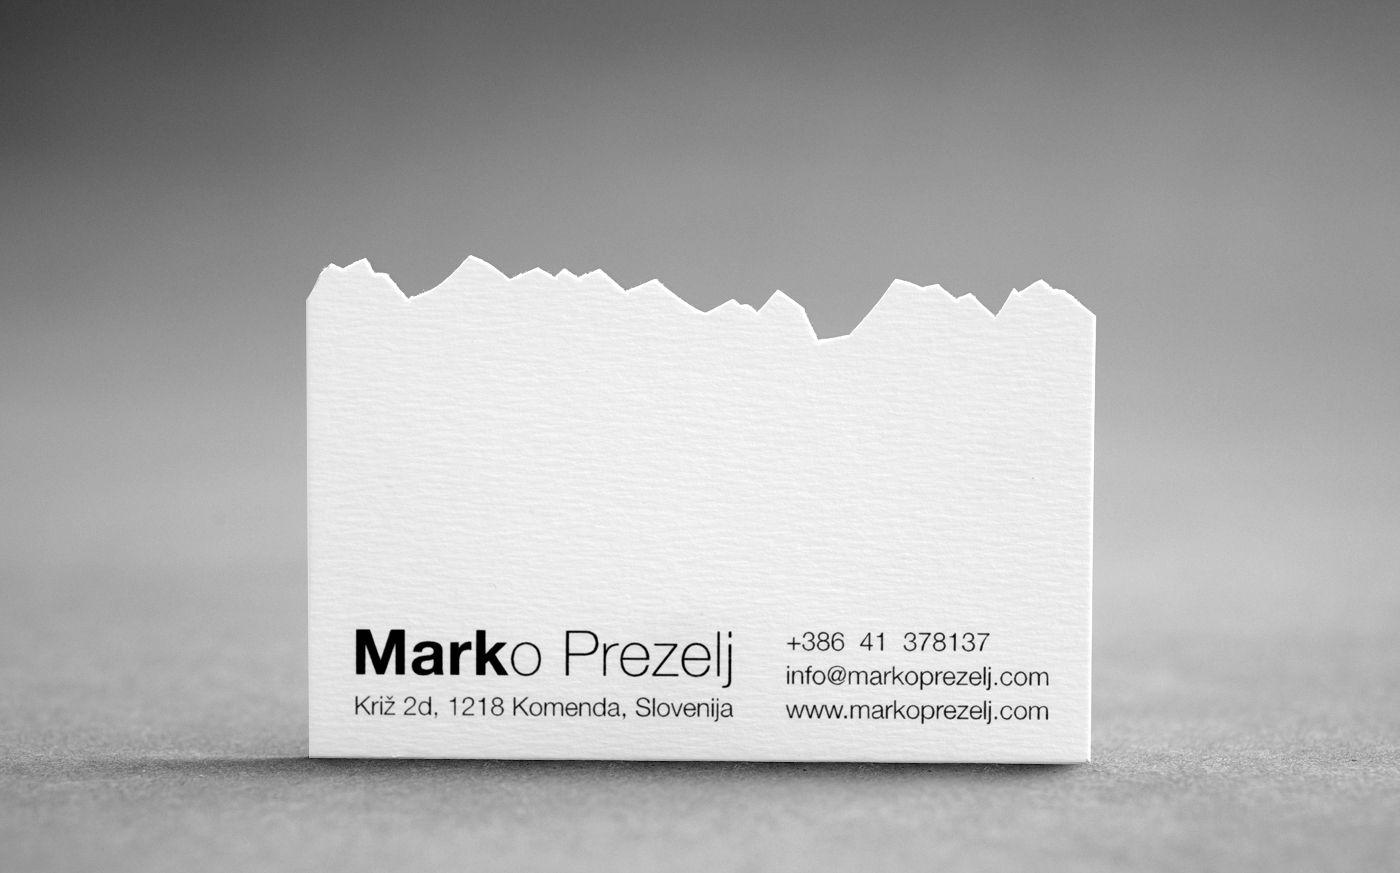 Marko Prezelj